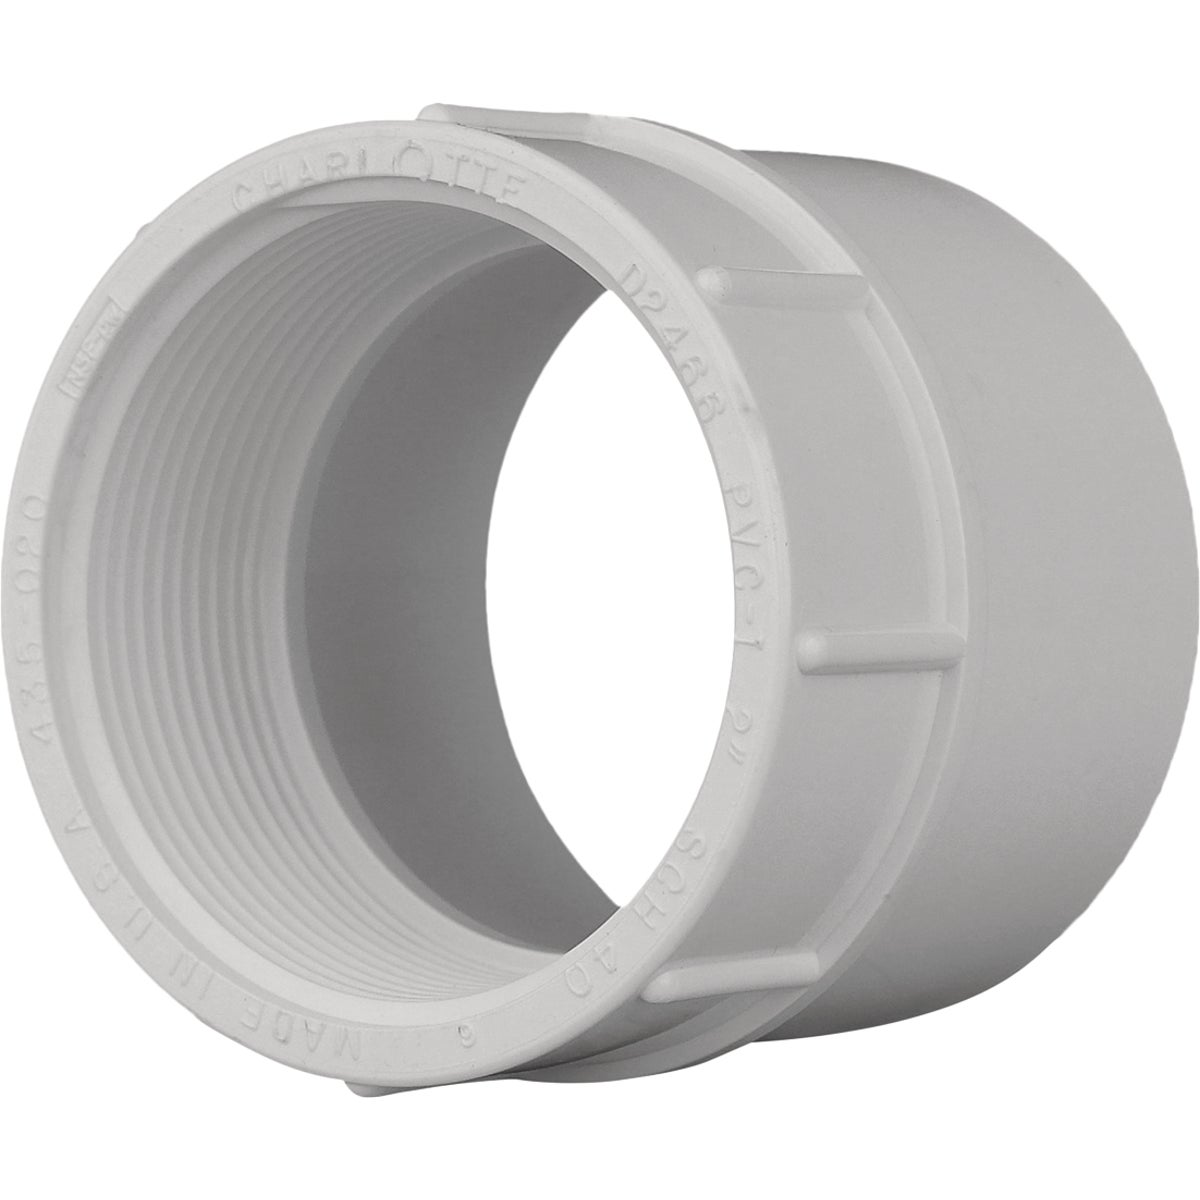 3/4X1/2 PVC SXF ADAPTER - 30375 by Genova Inc